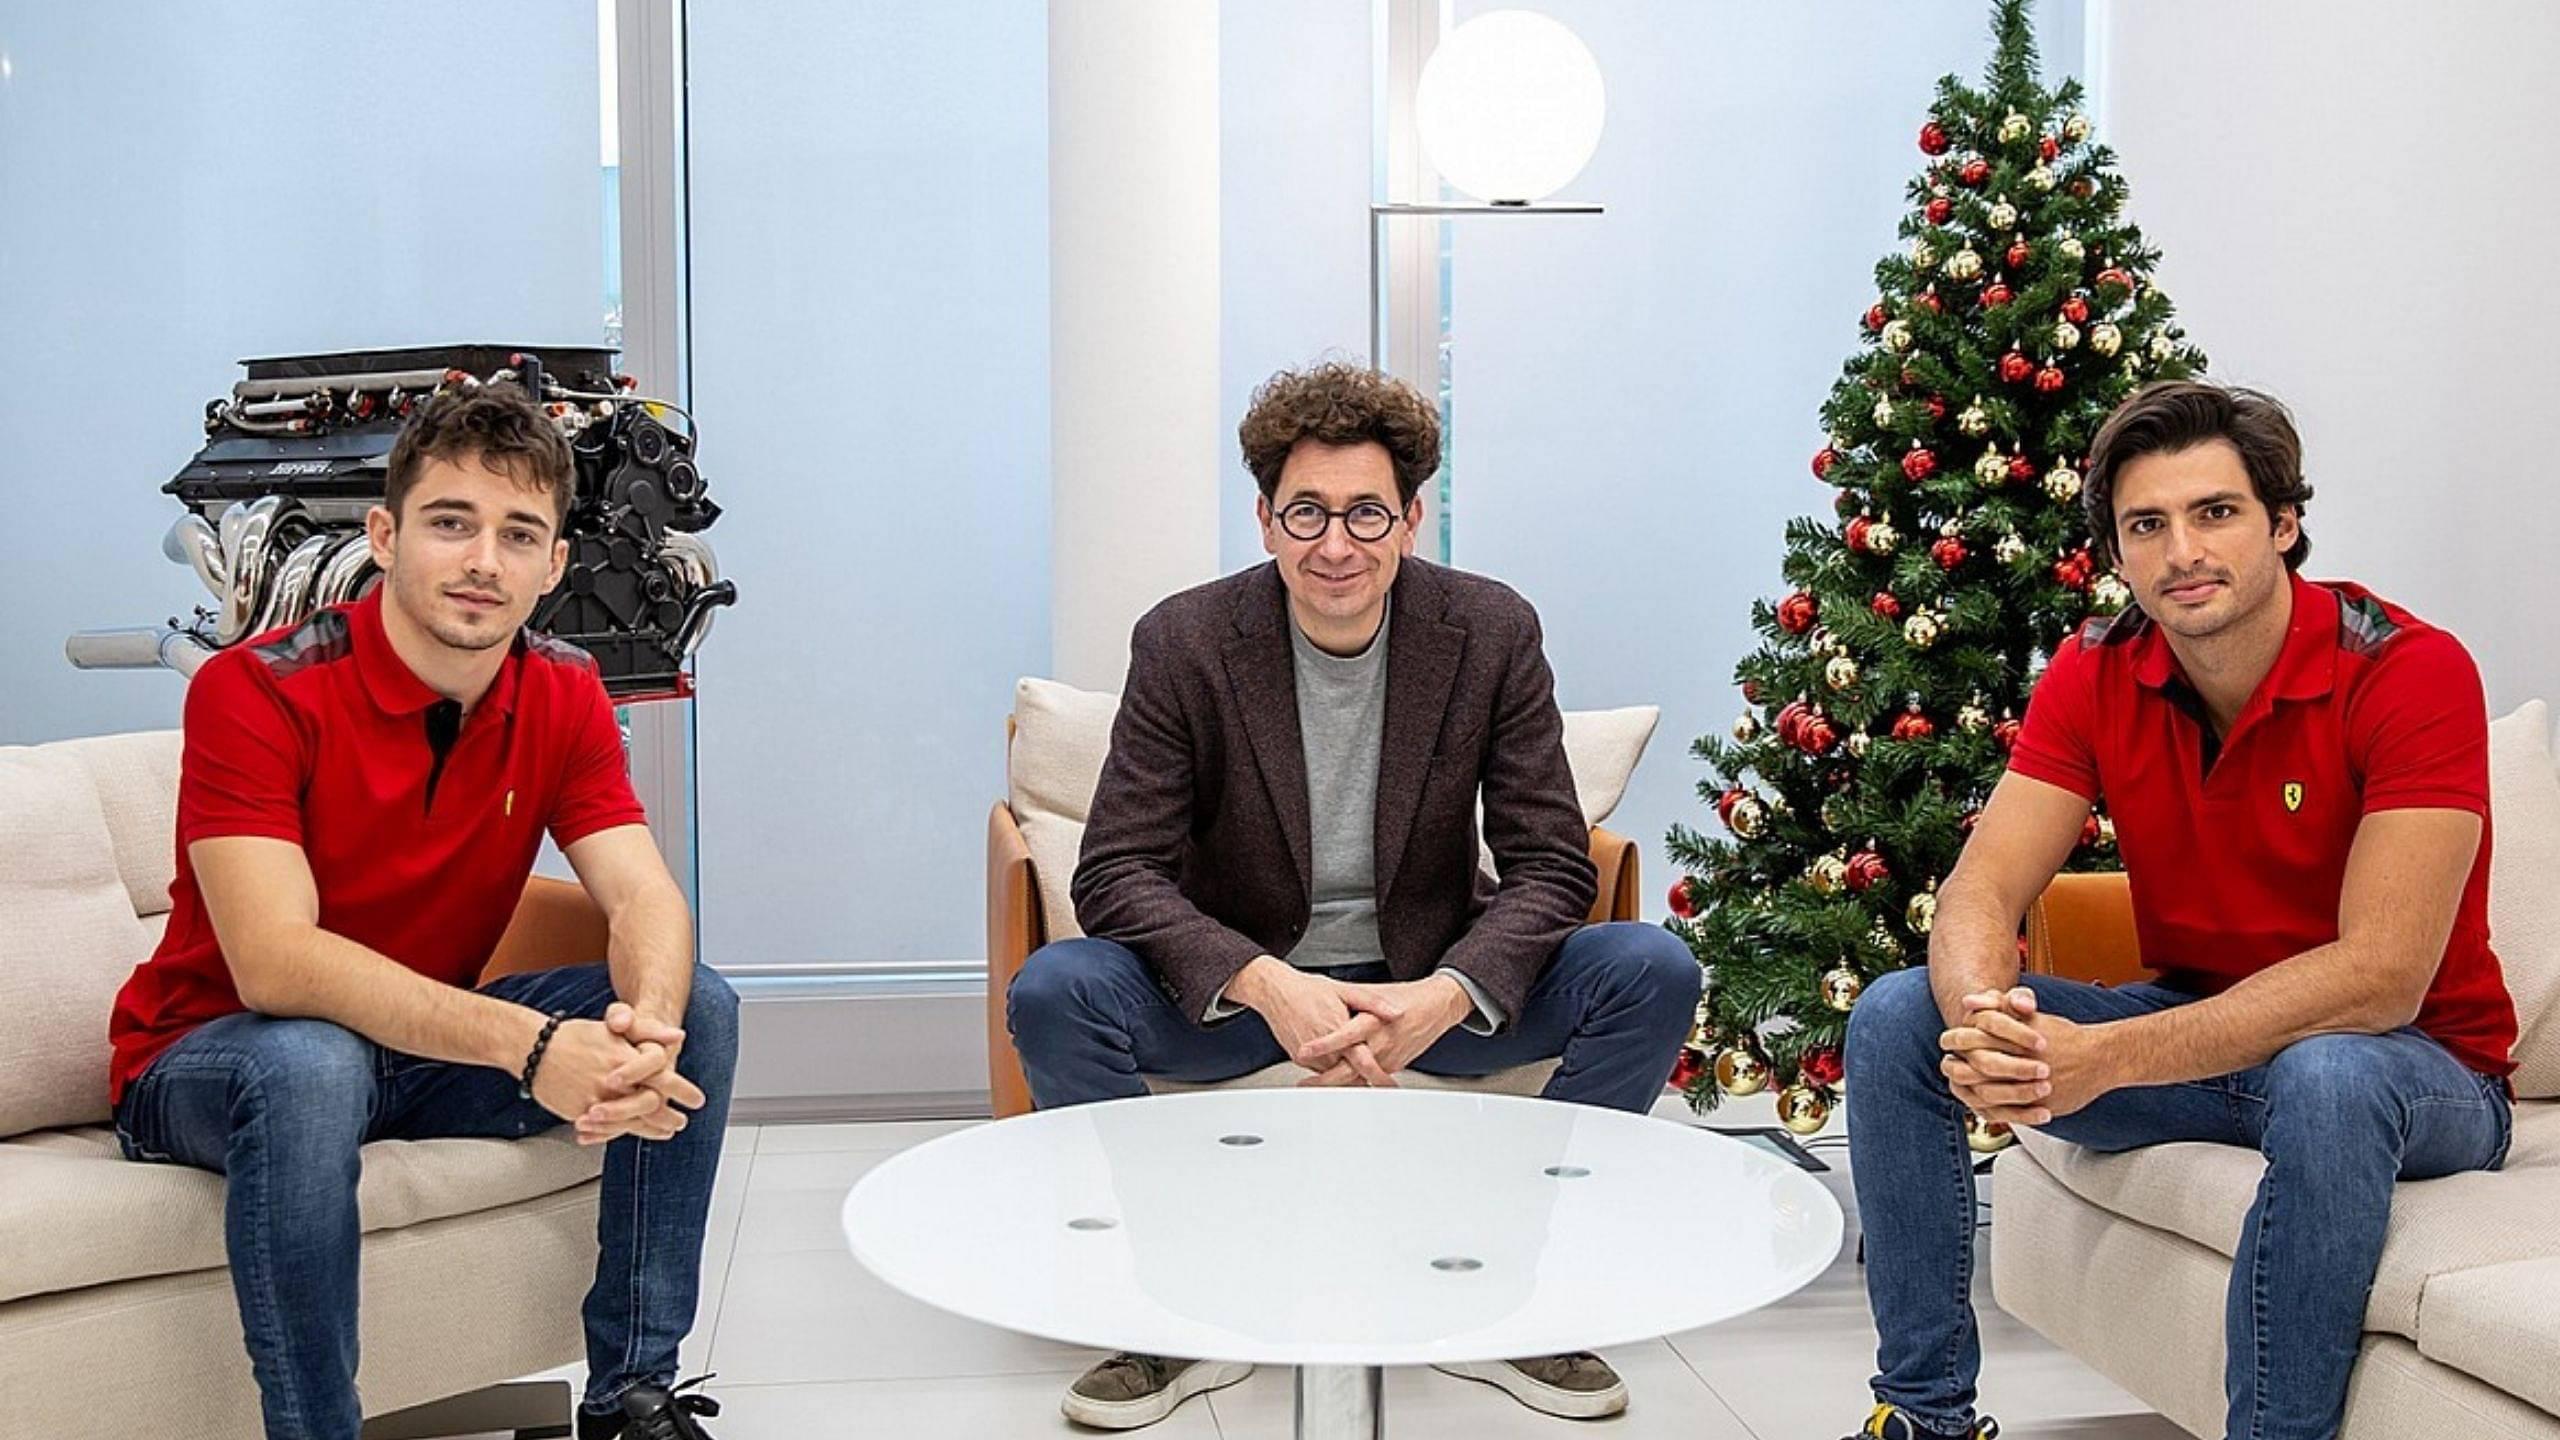 """I do not have a crystal ball"" - Mattia Binotto unsure if Ferrari will win races this season"